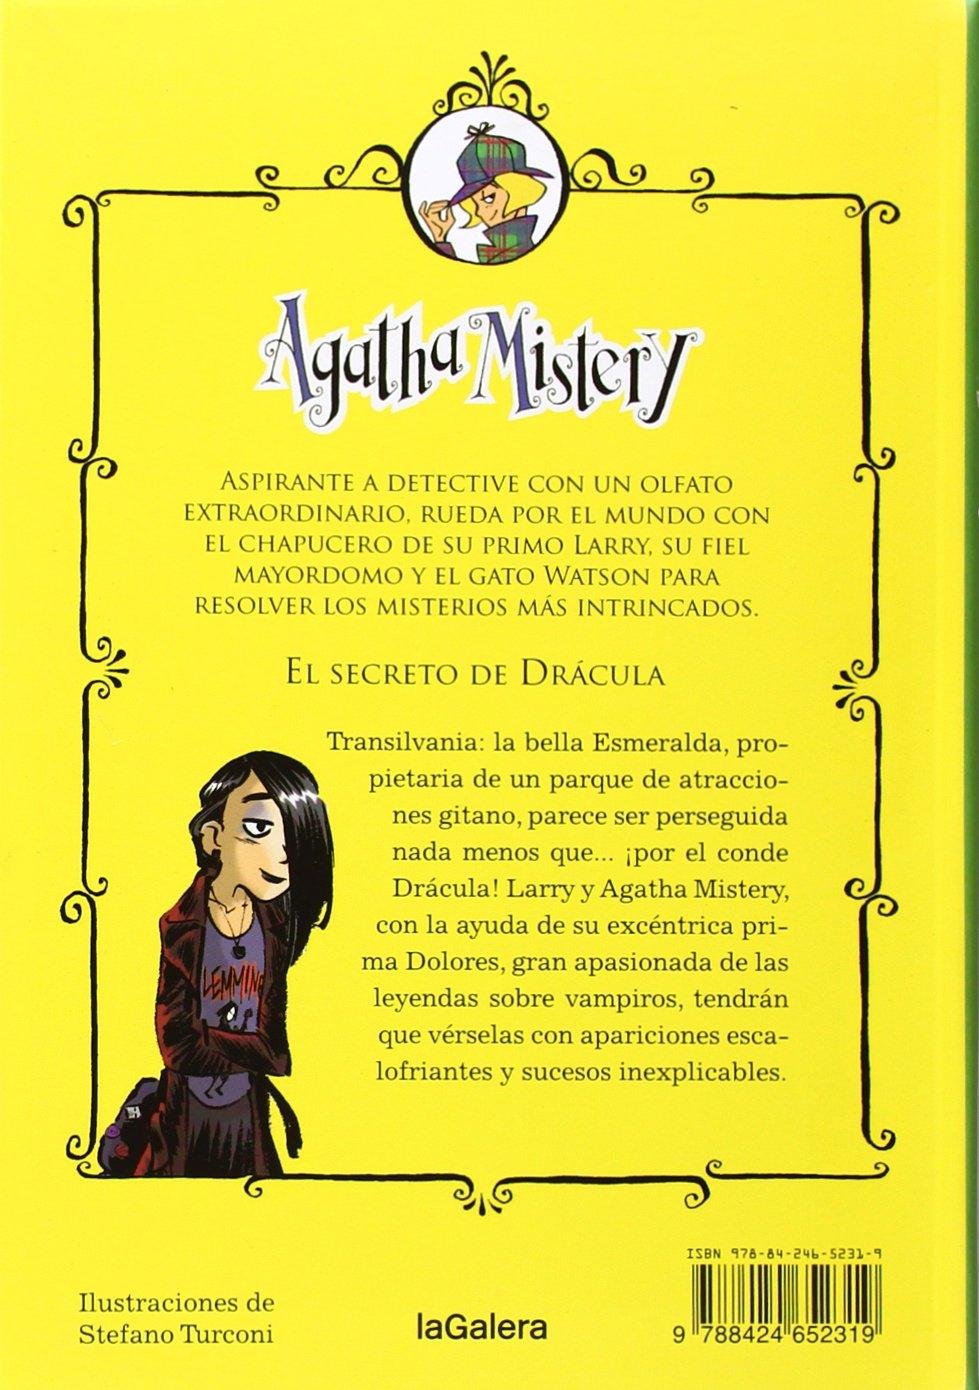 Agatha Mistry: El secreto de drácula # 15 (Spanish Edition): Sir Steve Stevenson, La Galera, Stefano Turconi: 9788424652319: Amazon.com: Books